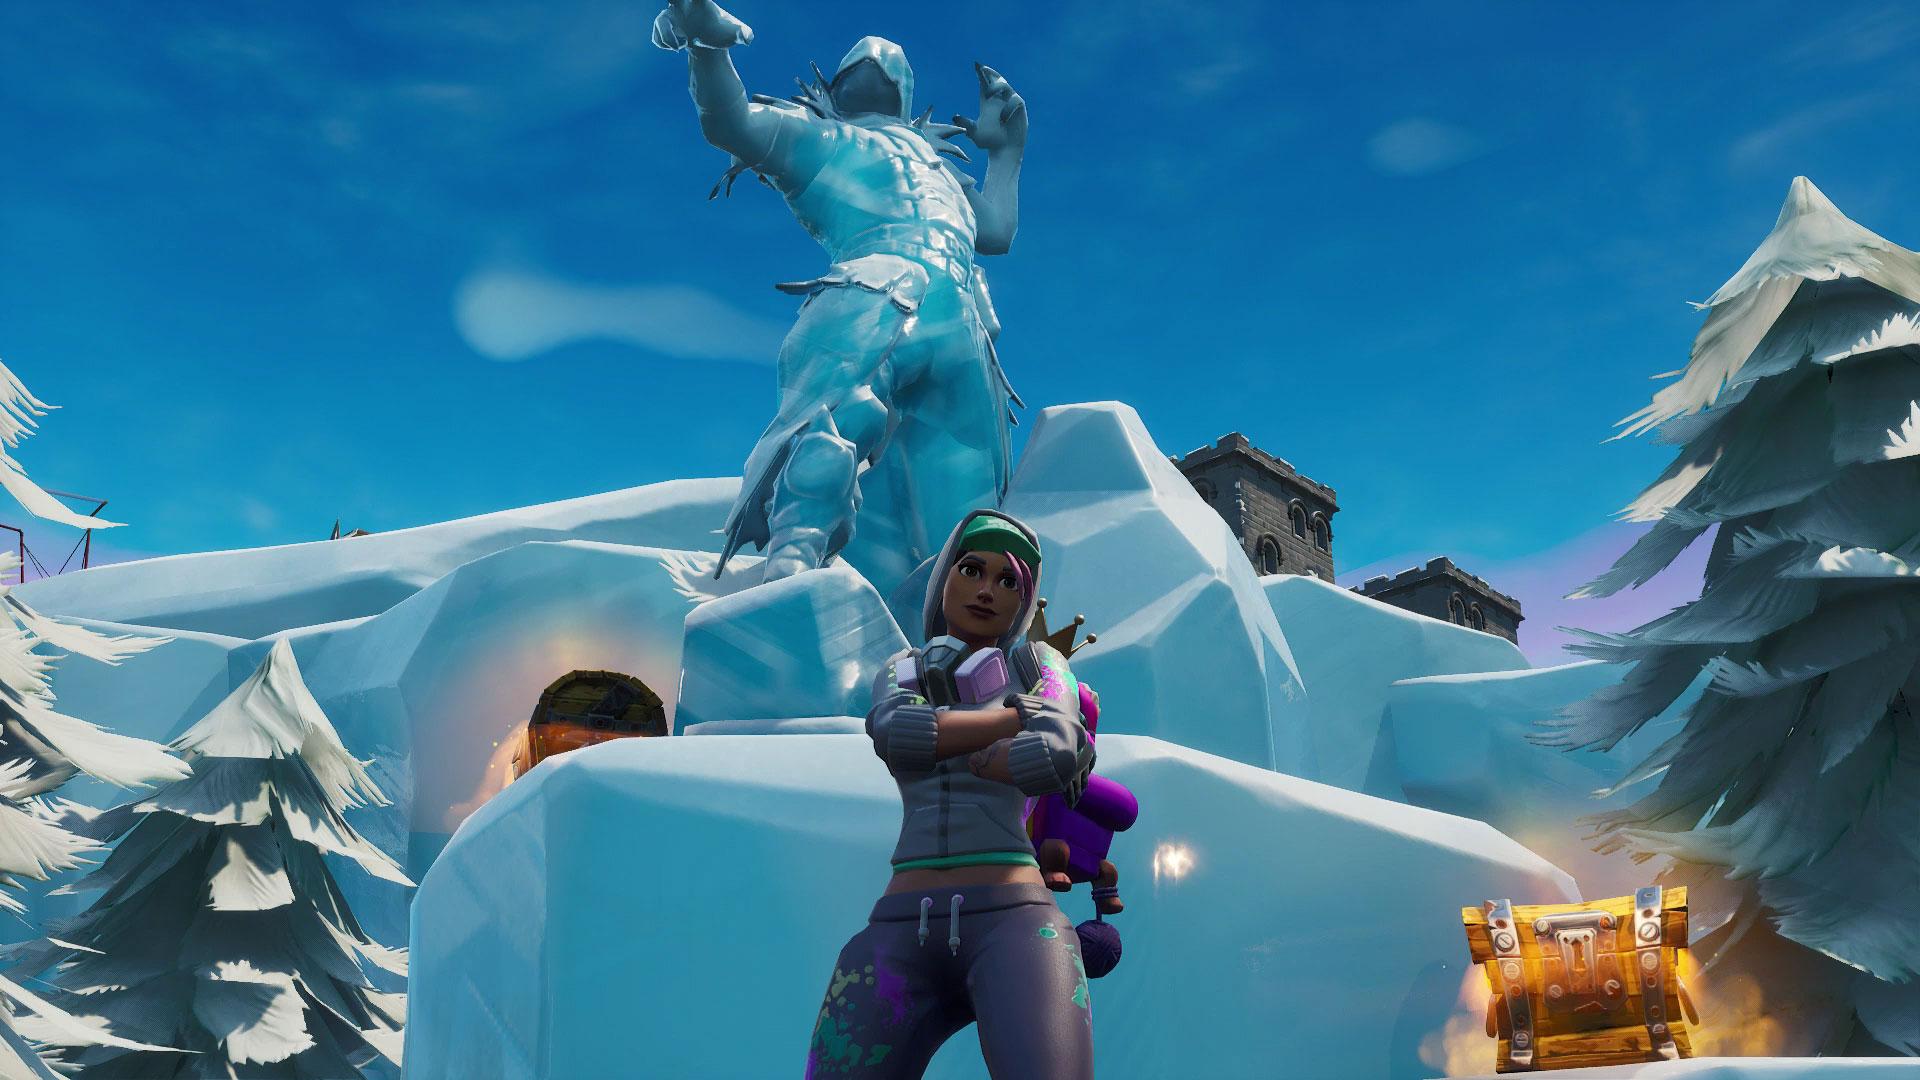 fortnite dance between three ice sculptures three dinosaurs and four hotsprings gamesradar - dance between three ice sculptures fortnite season 8